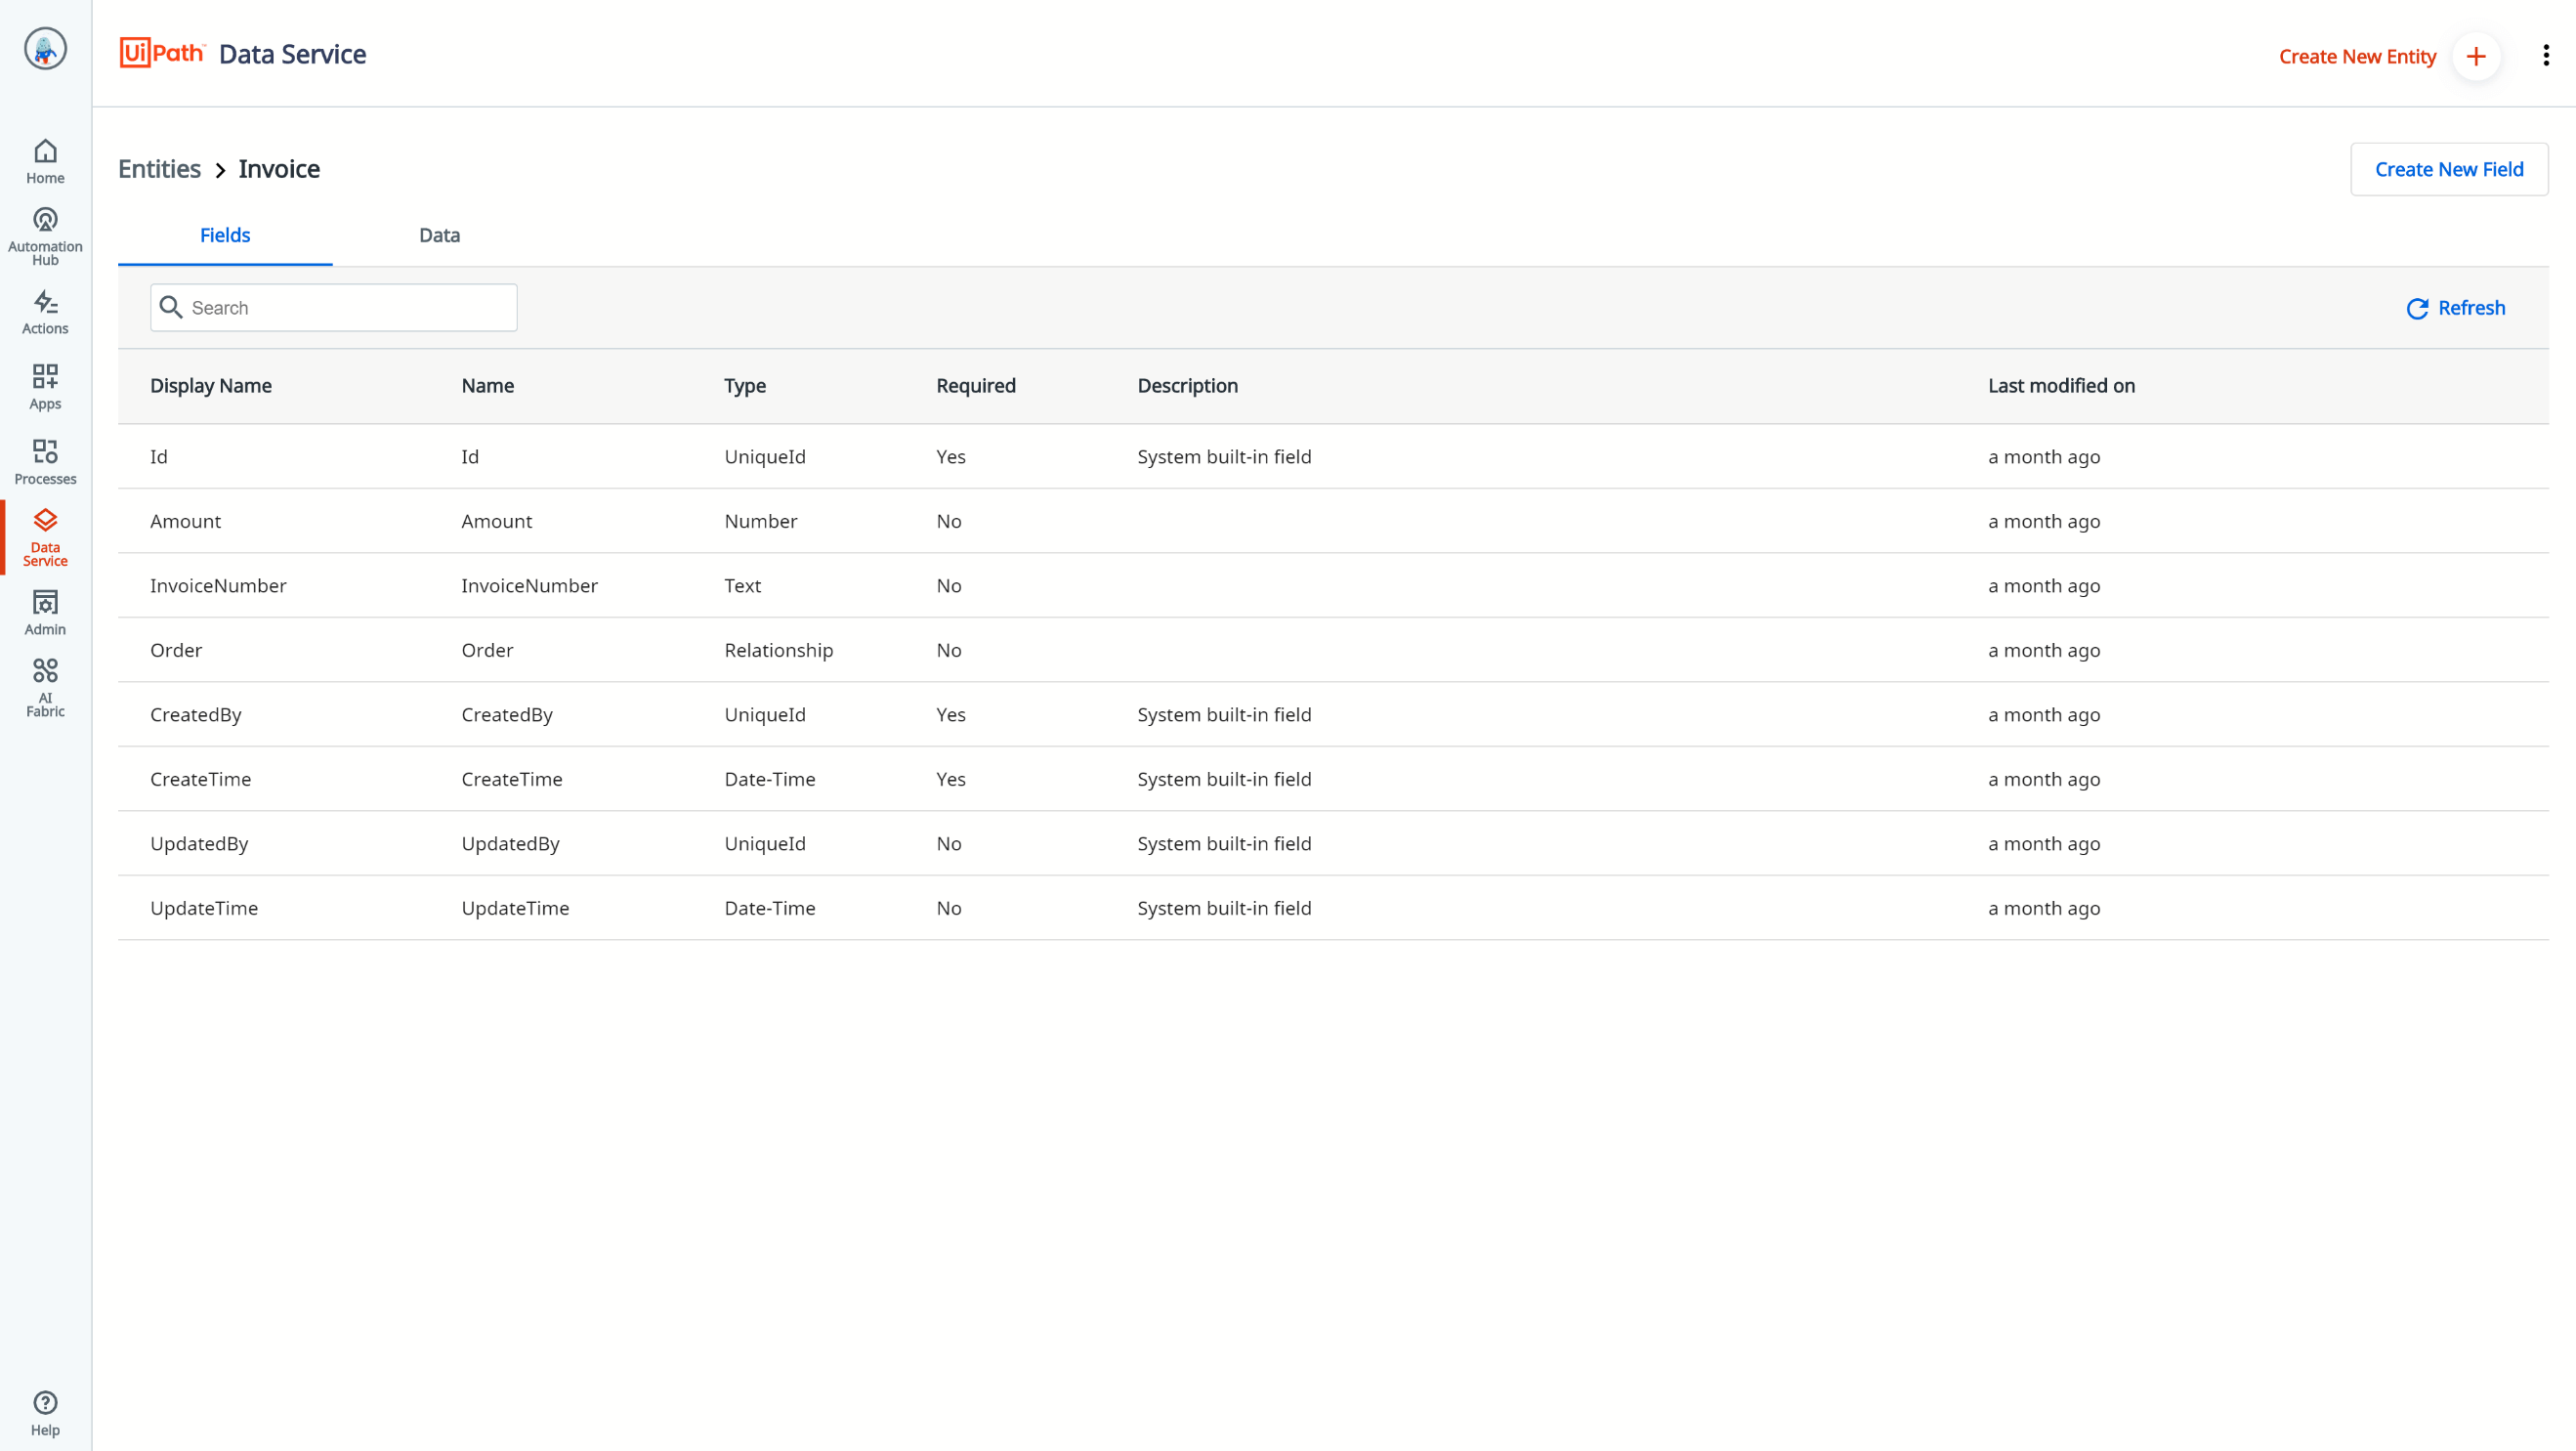 uipath-data-service